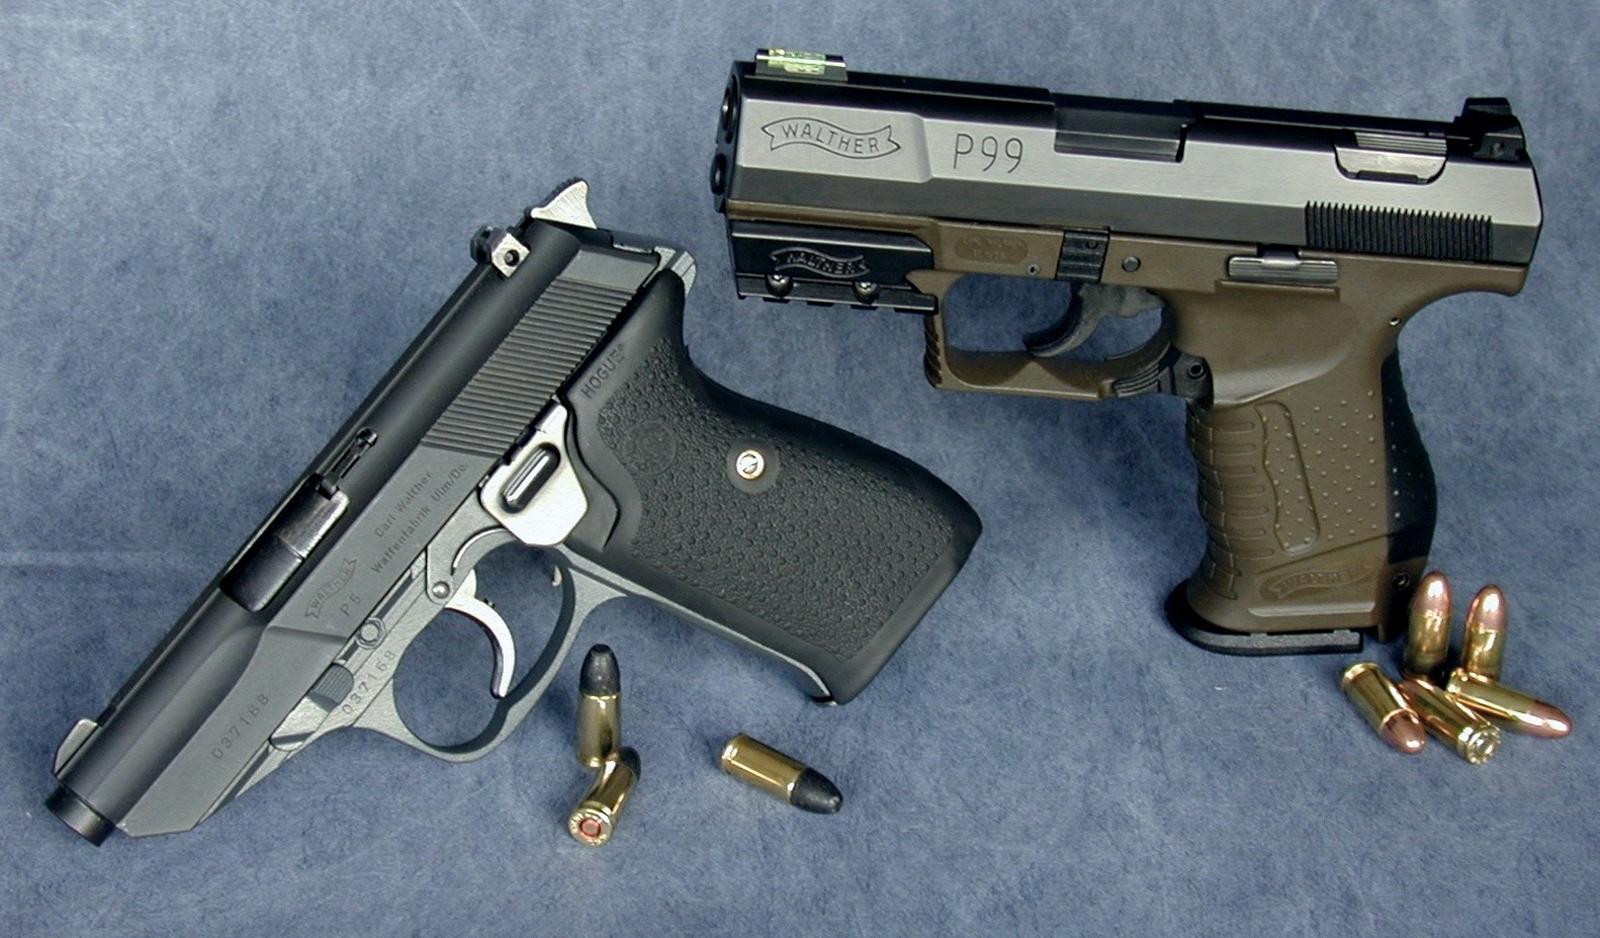 Walther P 99 AS Tabanca Resimleri HD Wallpapers ~ Kaliteli Resim